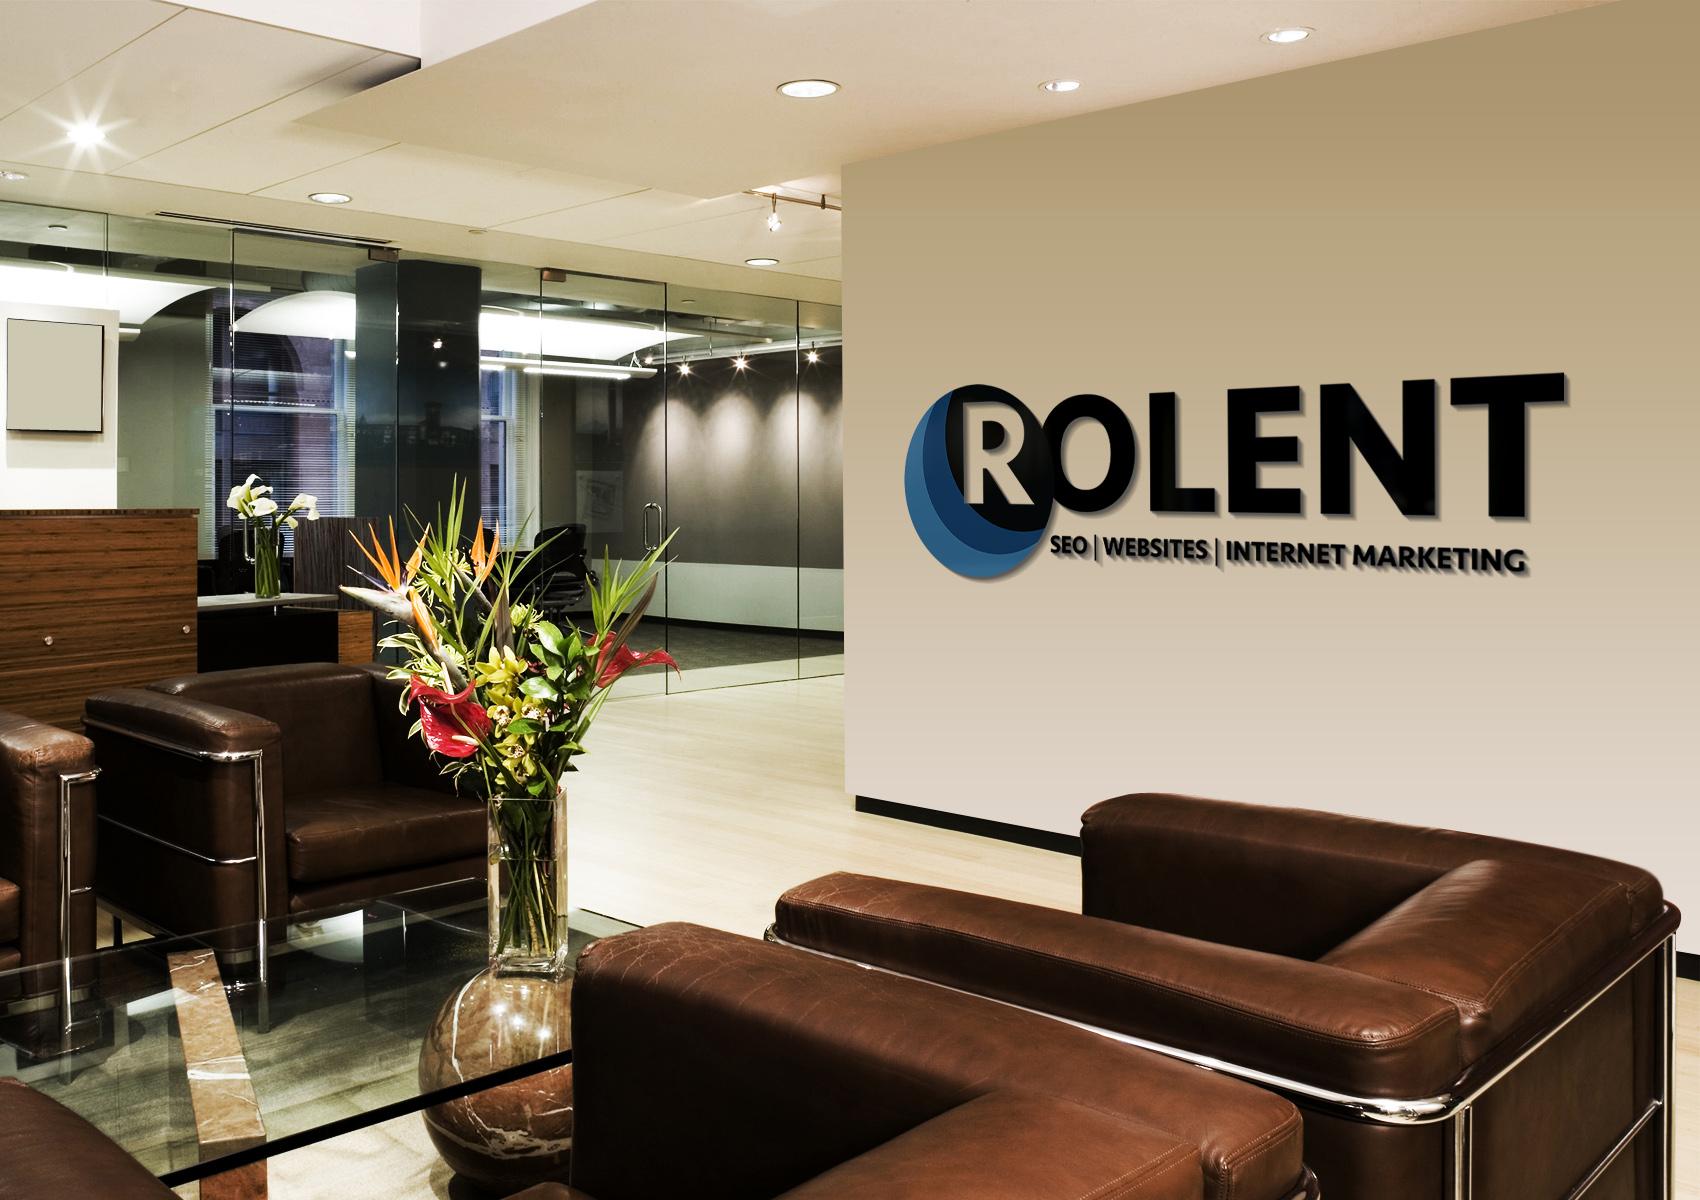 Rolent